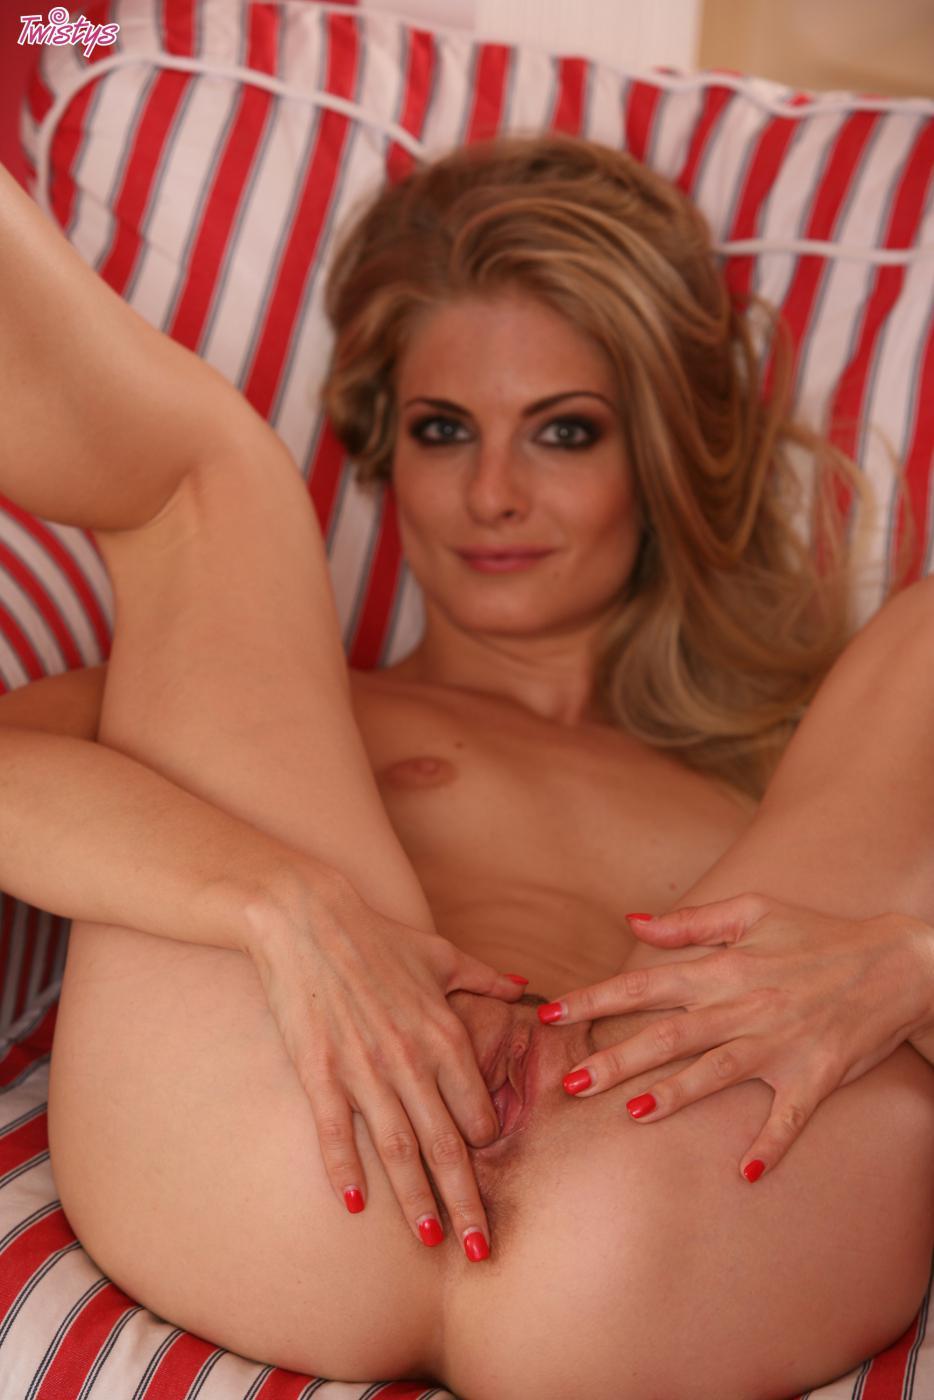 Светлая порноактриса Cayenne Klein порет игрушкой дырку писи